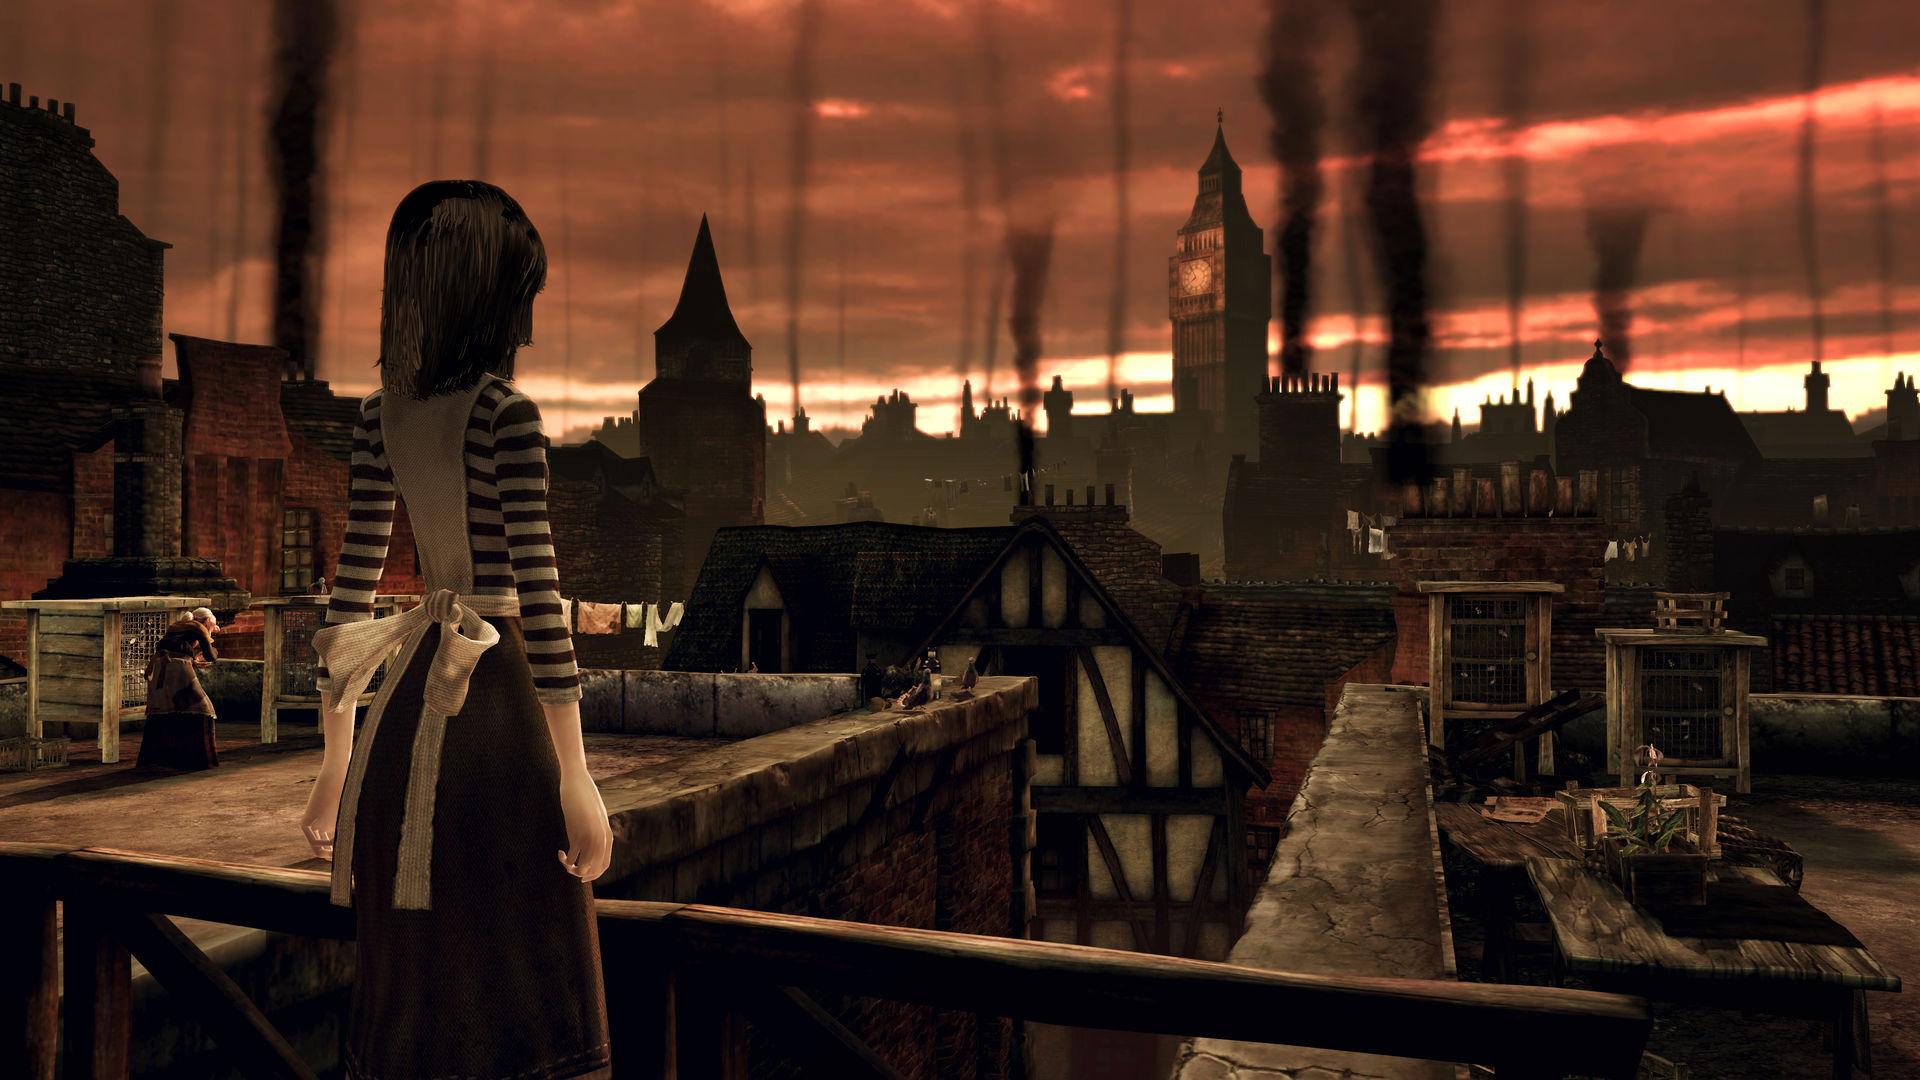 Alice madness returns steam download baixaki escreva seu comentrio ccuart Gallery